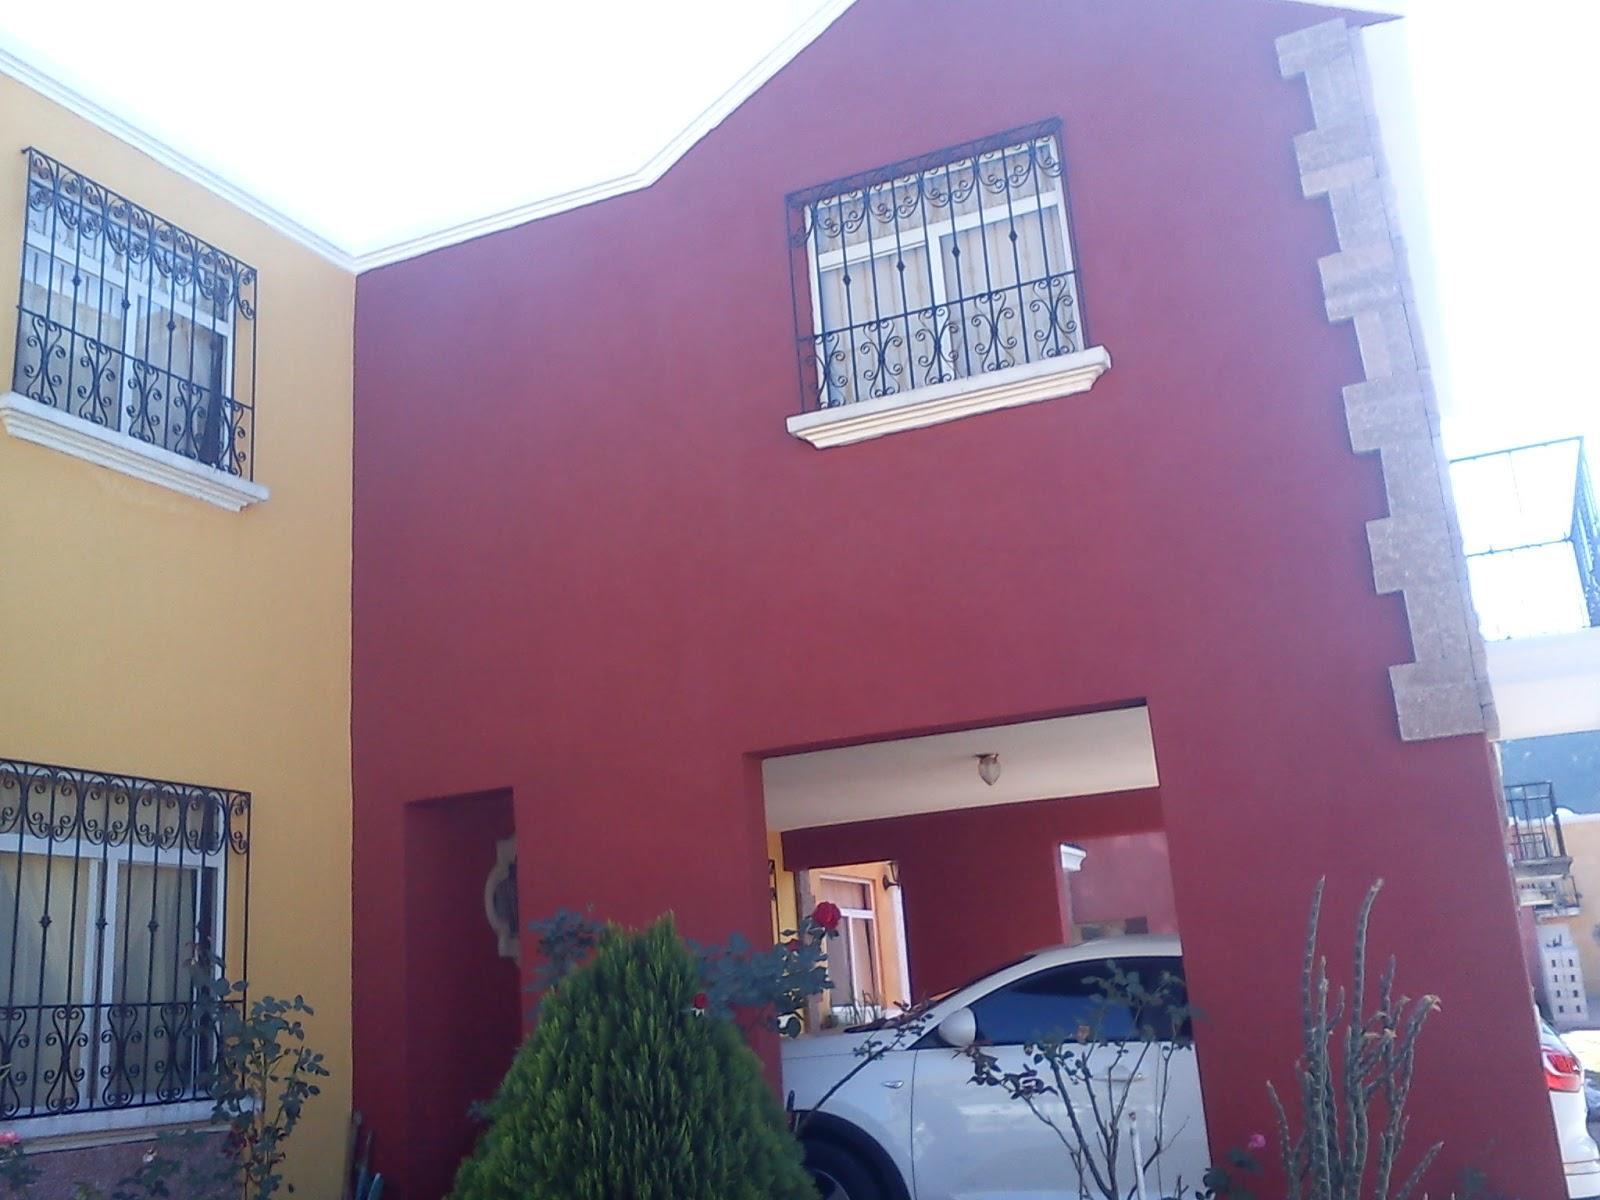 GUATEMALA PRÓSPERA, Comunícate Cañadas: Pintura exterior de las ...